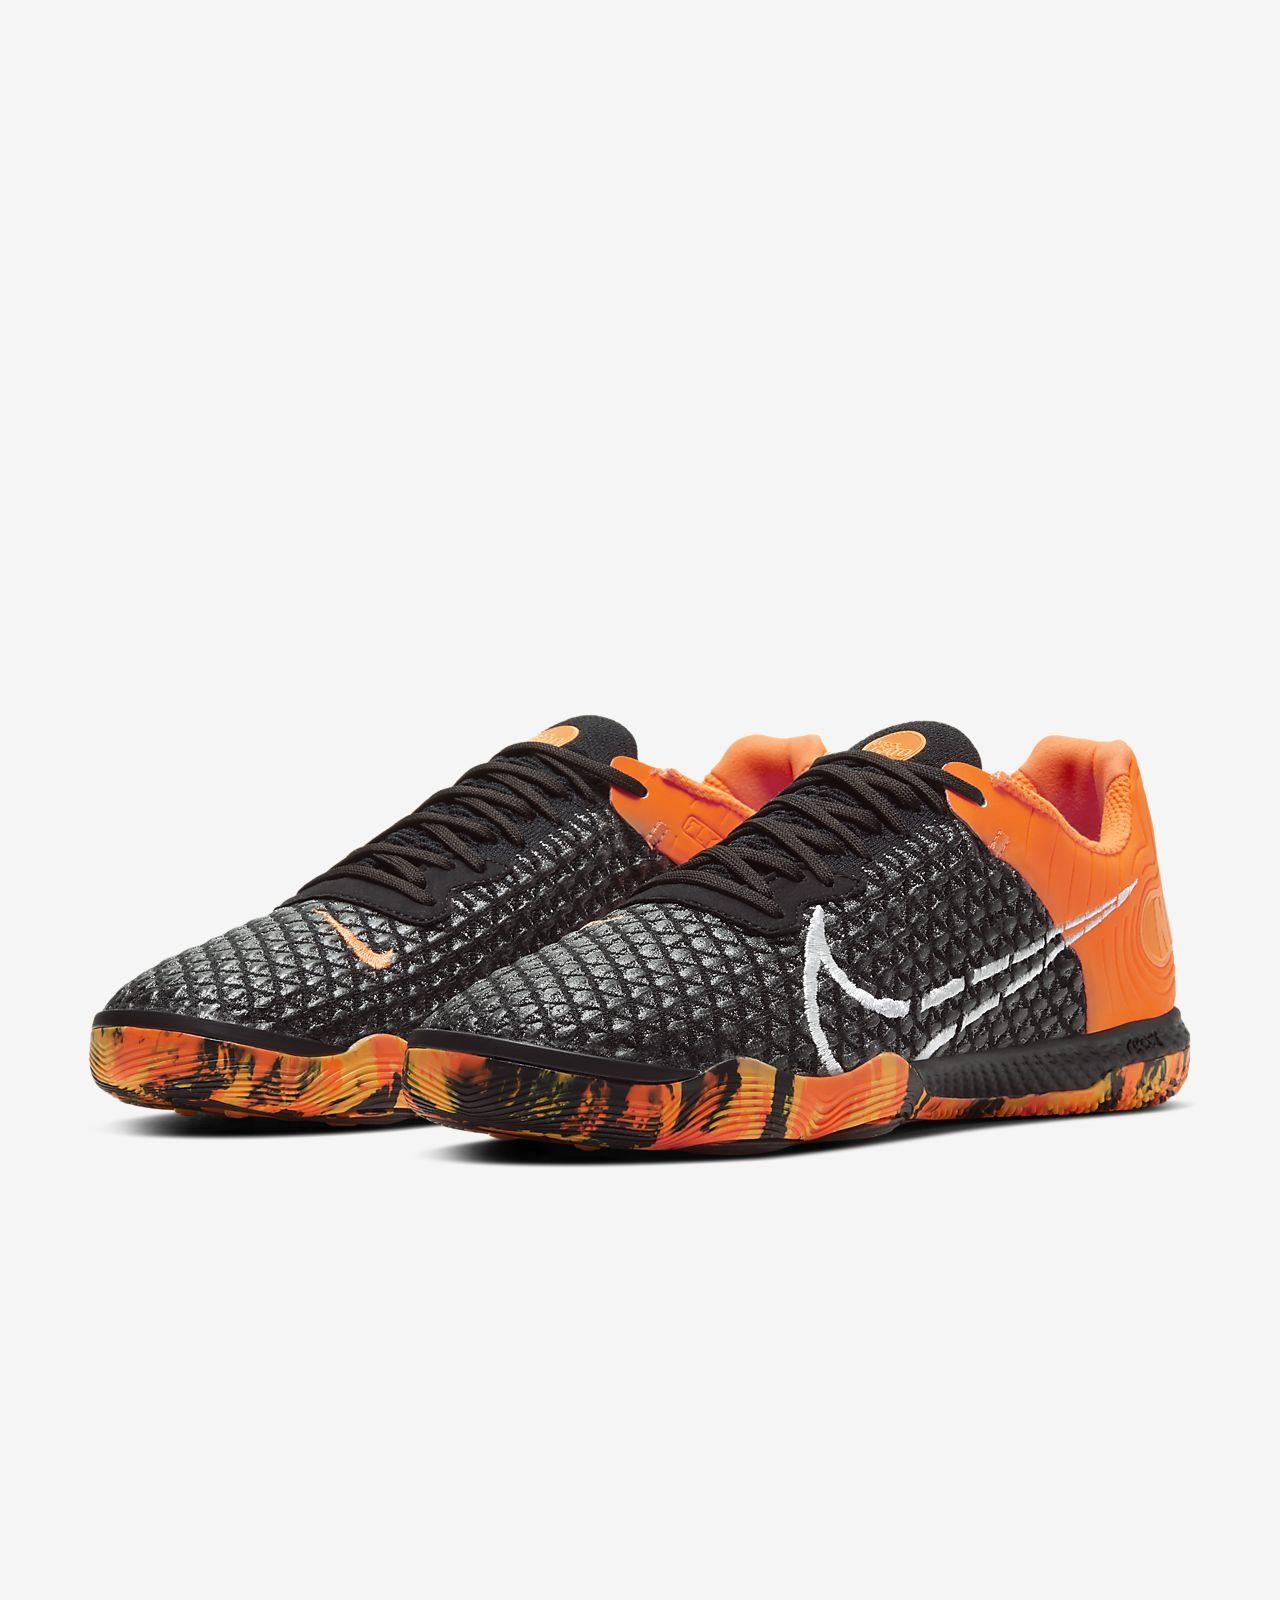 Nike React Gato | Indoor football shoes, Latest football